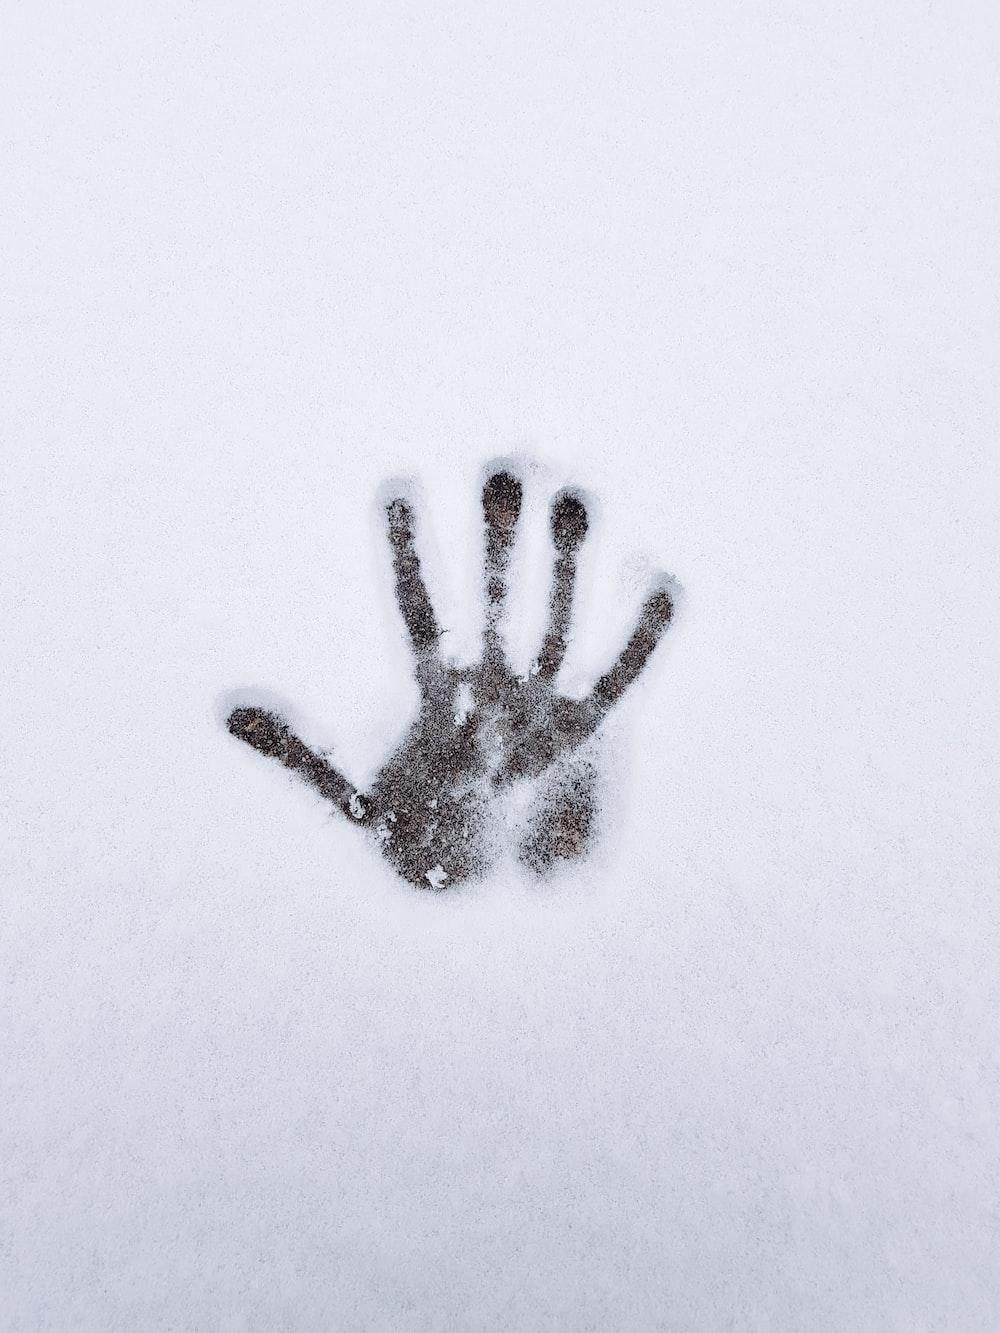 human palm on snow